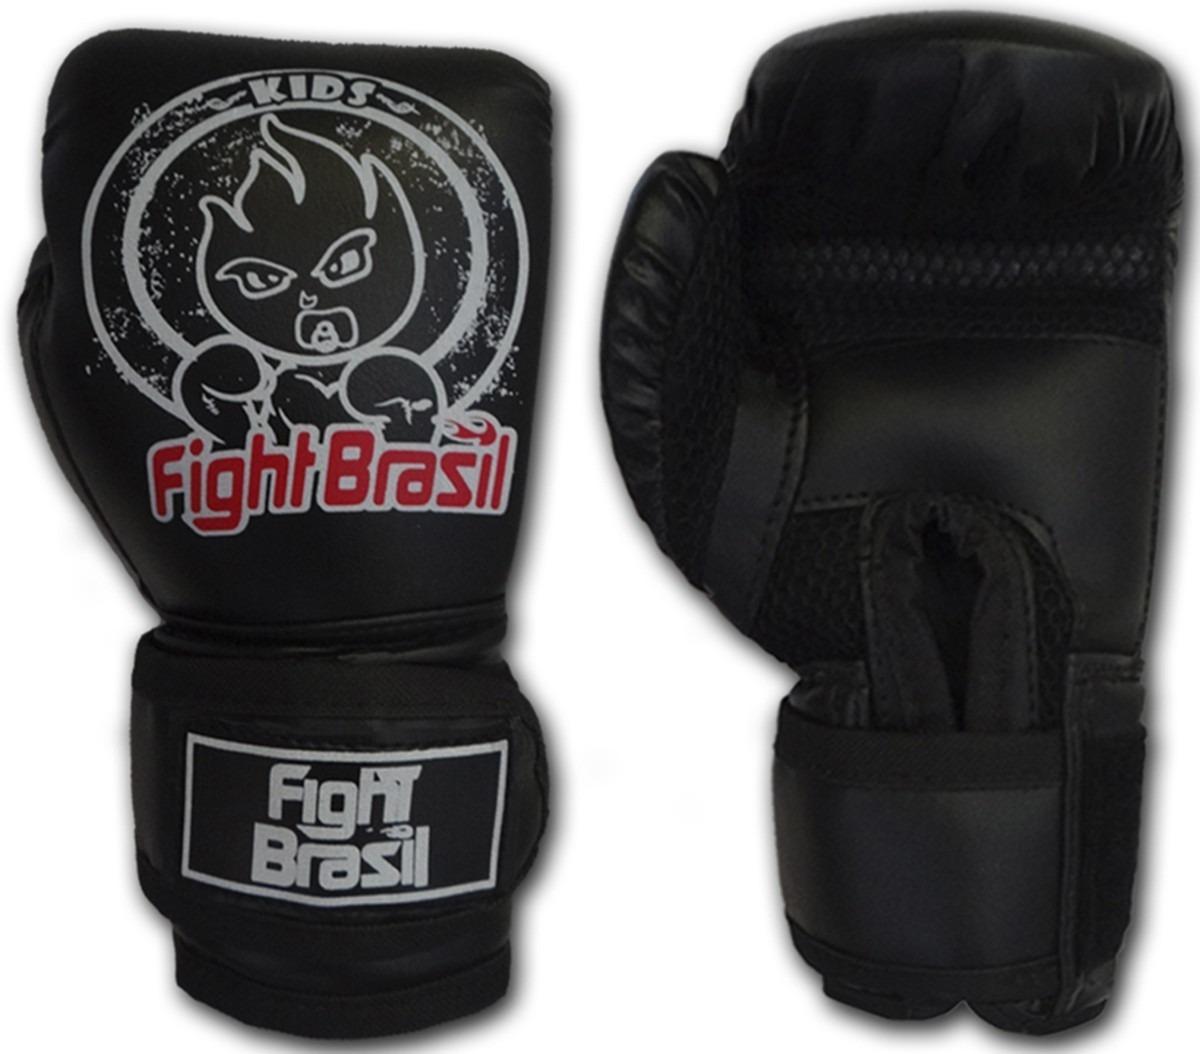 a613ccb41 luva boxe muay thai infantil 8 oz fight brasil frete barato. Carregando zoom .